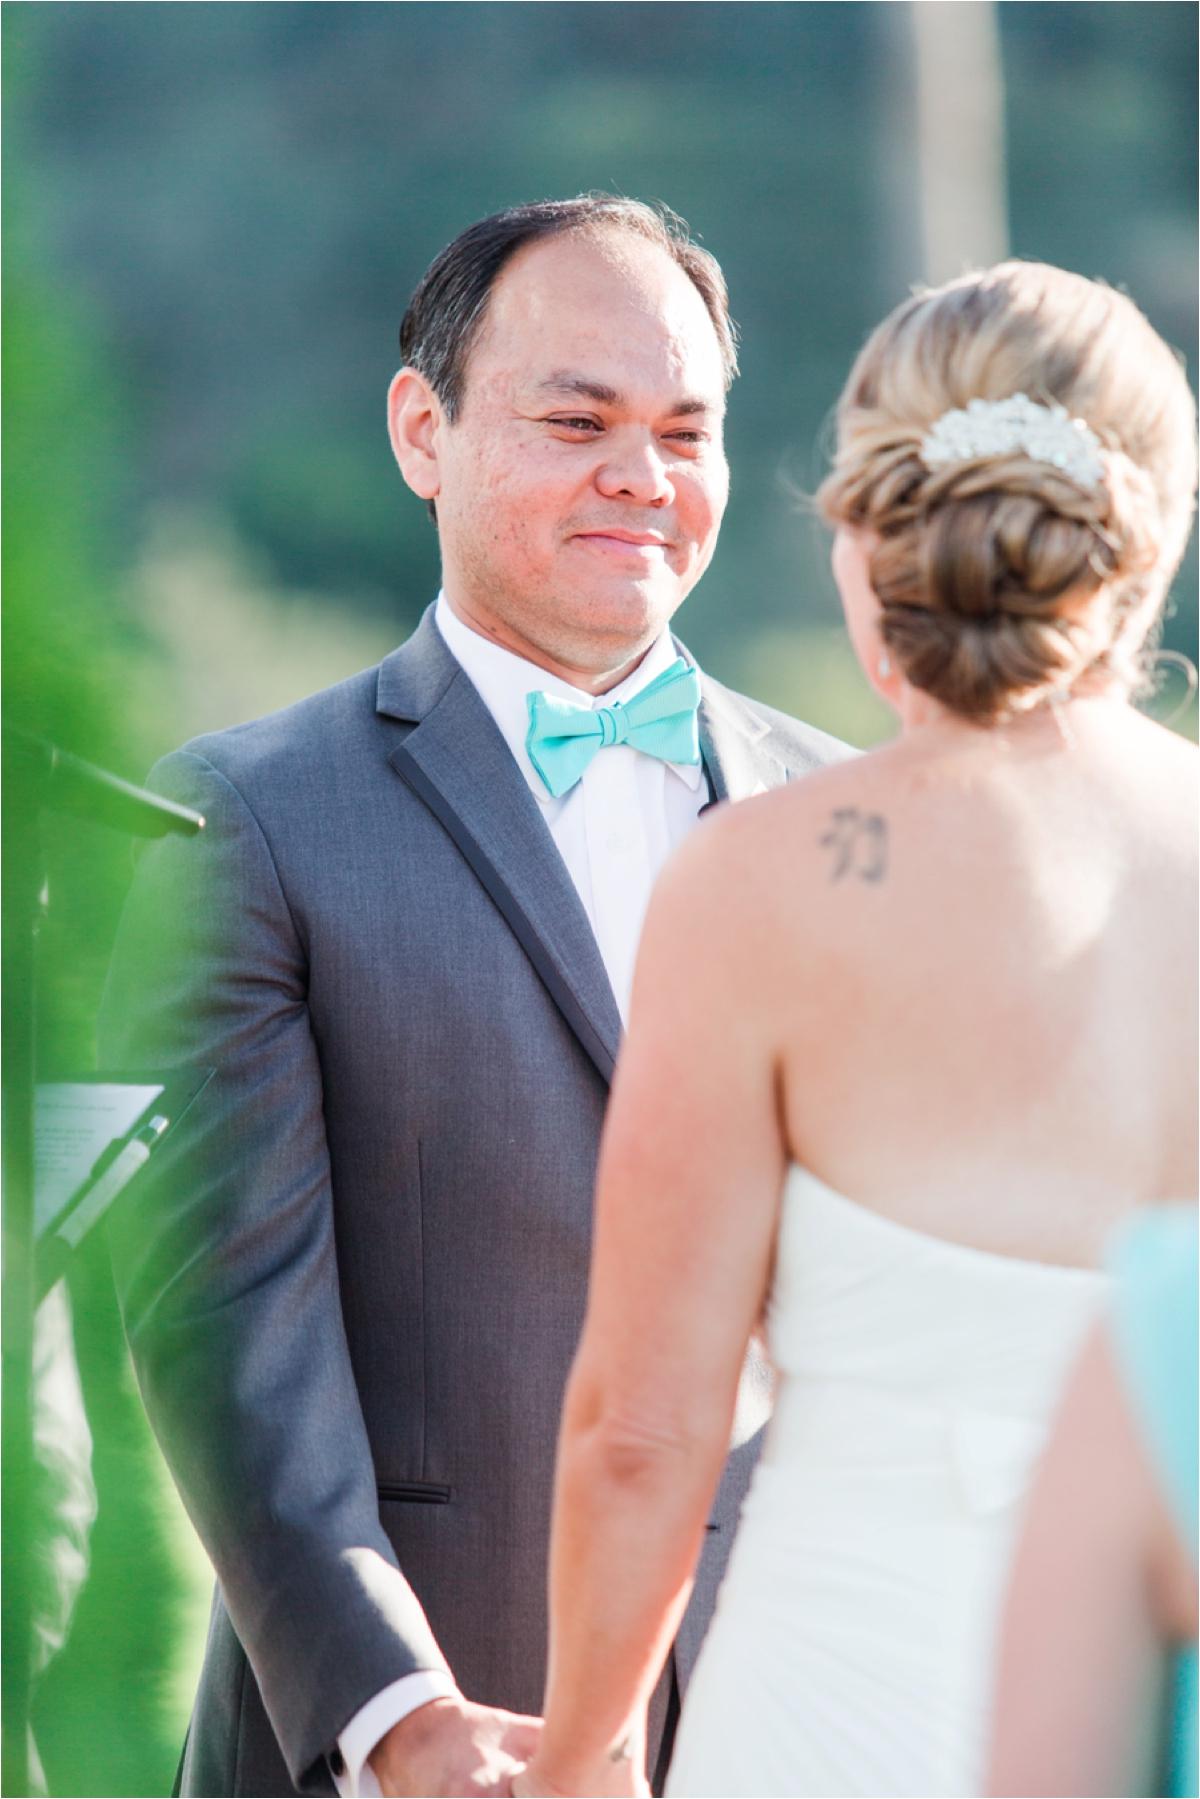 Eagle Ridge Golf Club wedding pictures by Briana Calderon Photography_0434.jpg